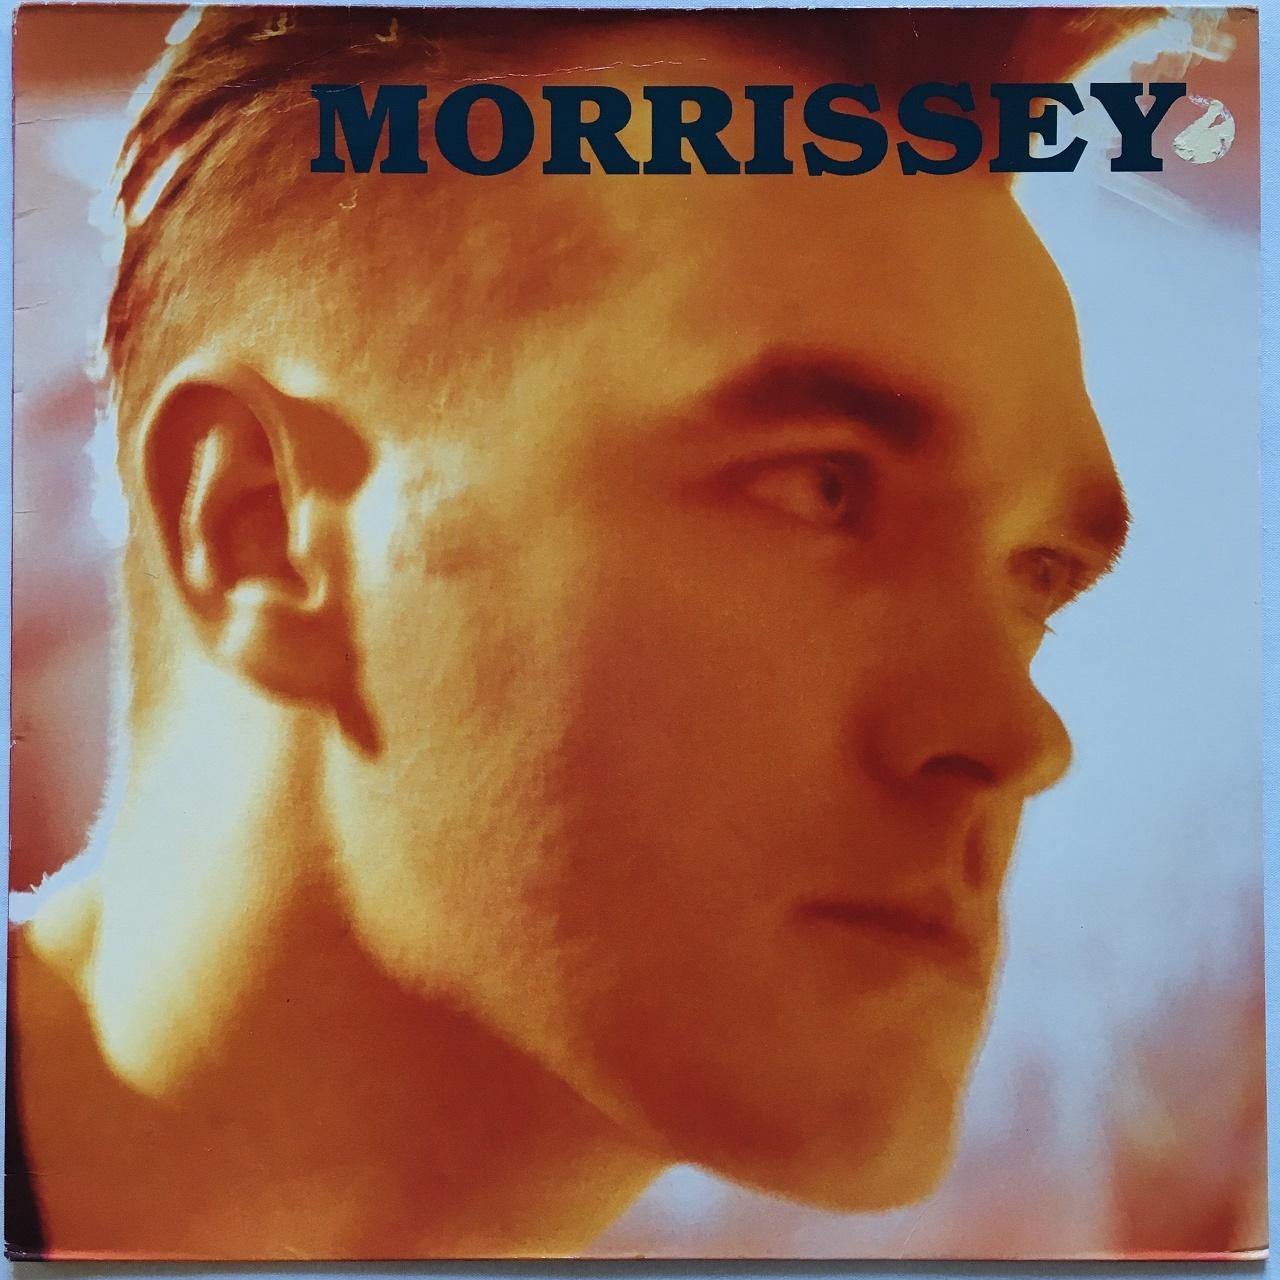 【12inch・英盤】Morrissey / Interesting Drug